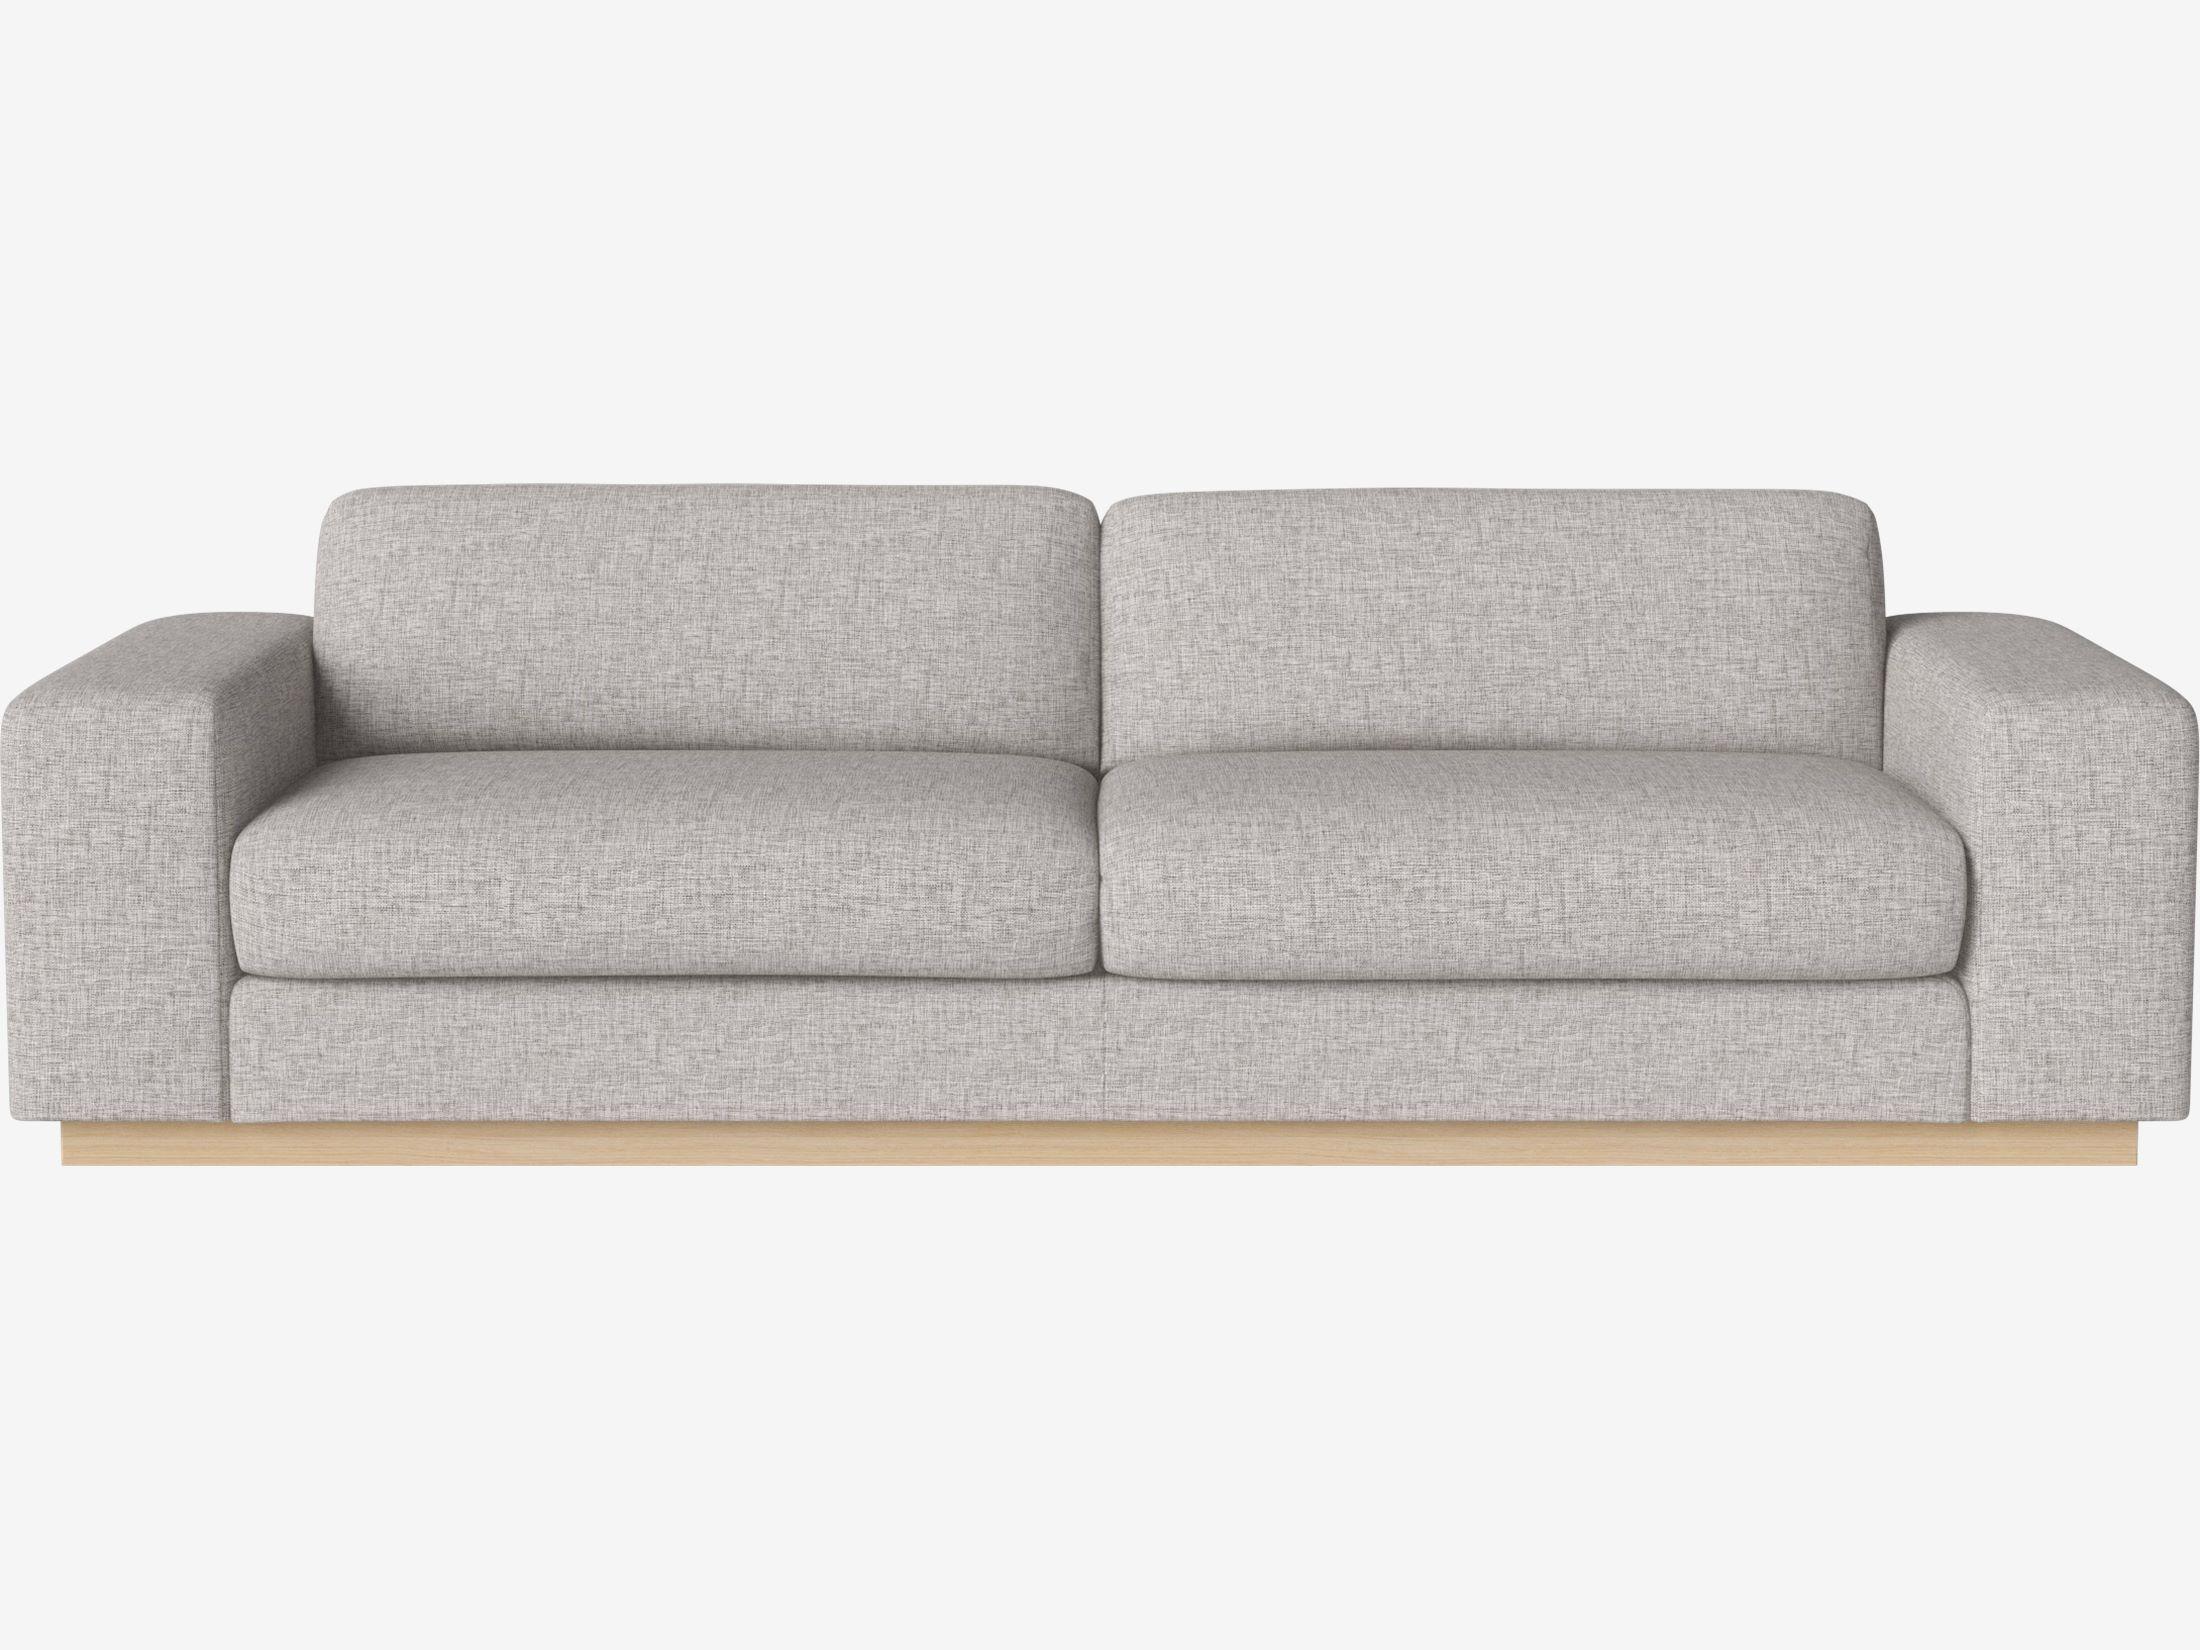 Sepia 3 Sitzer Sofa Glismand Rudiger Nantes Stoff Multi Grey 3 Sitzer Sofa Sofa Nantes